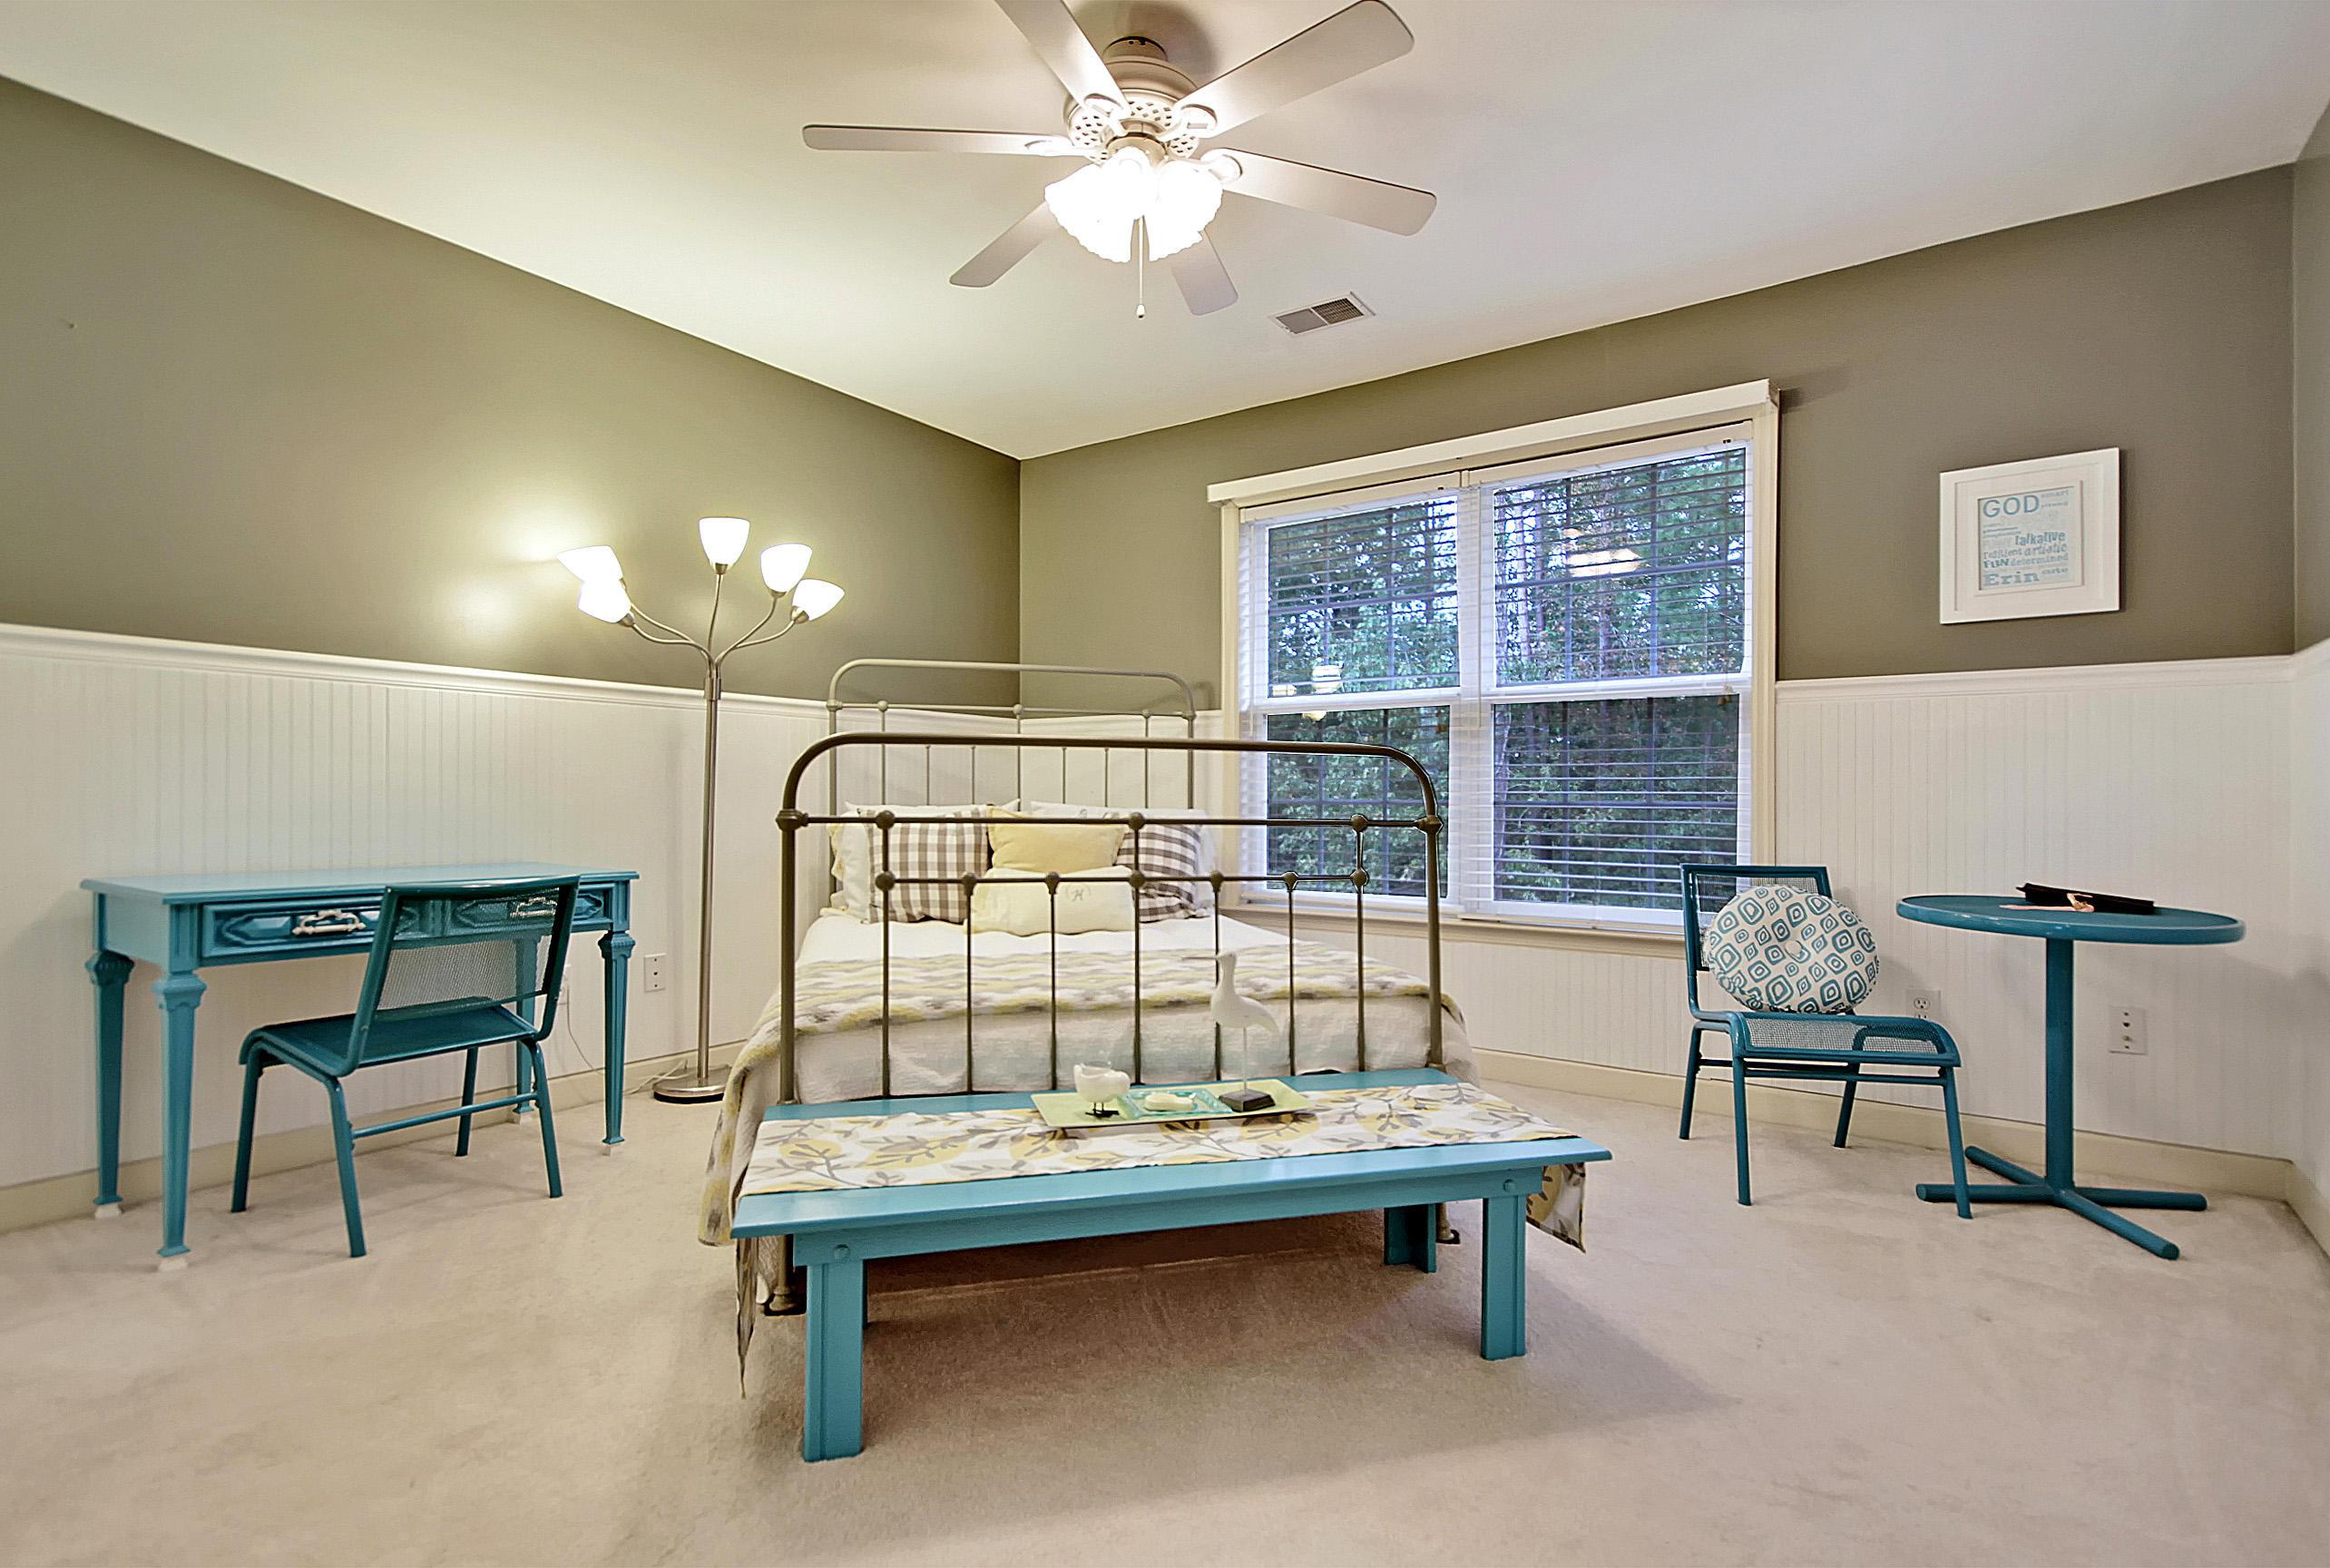 Dunes West Homes For Sale - 2449 Darts Cove, Mount Pleasant, SC - 39